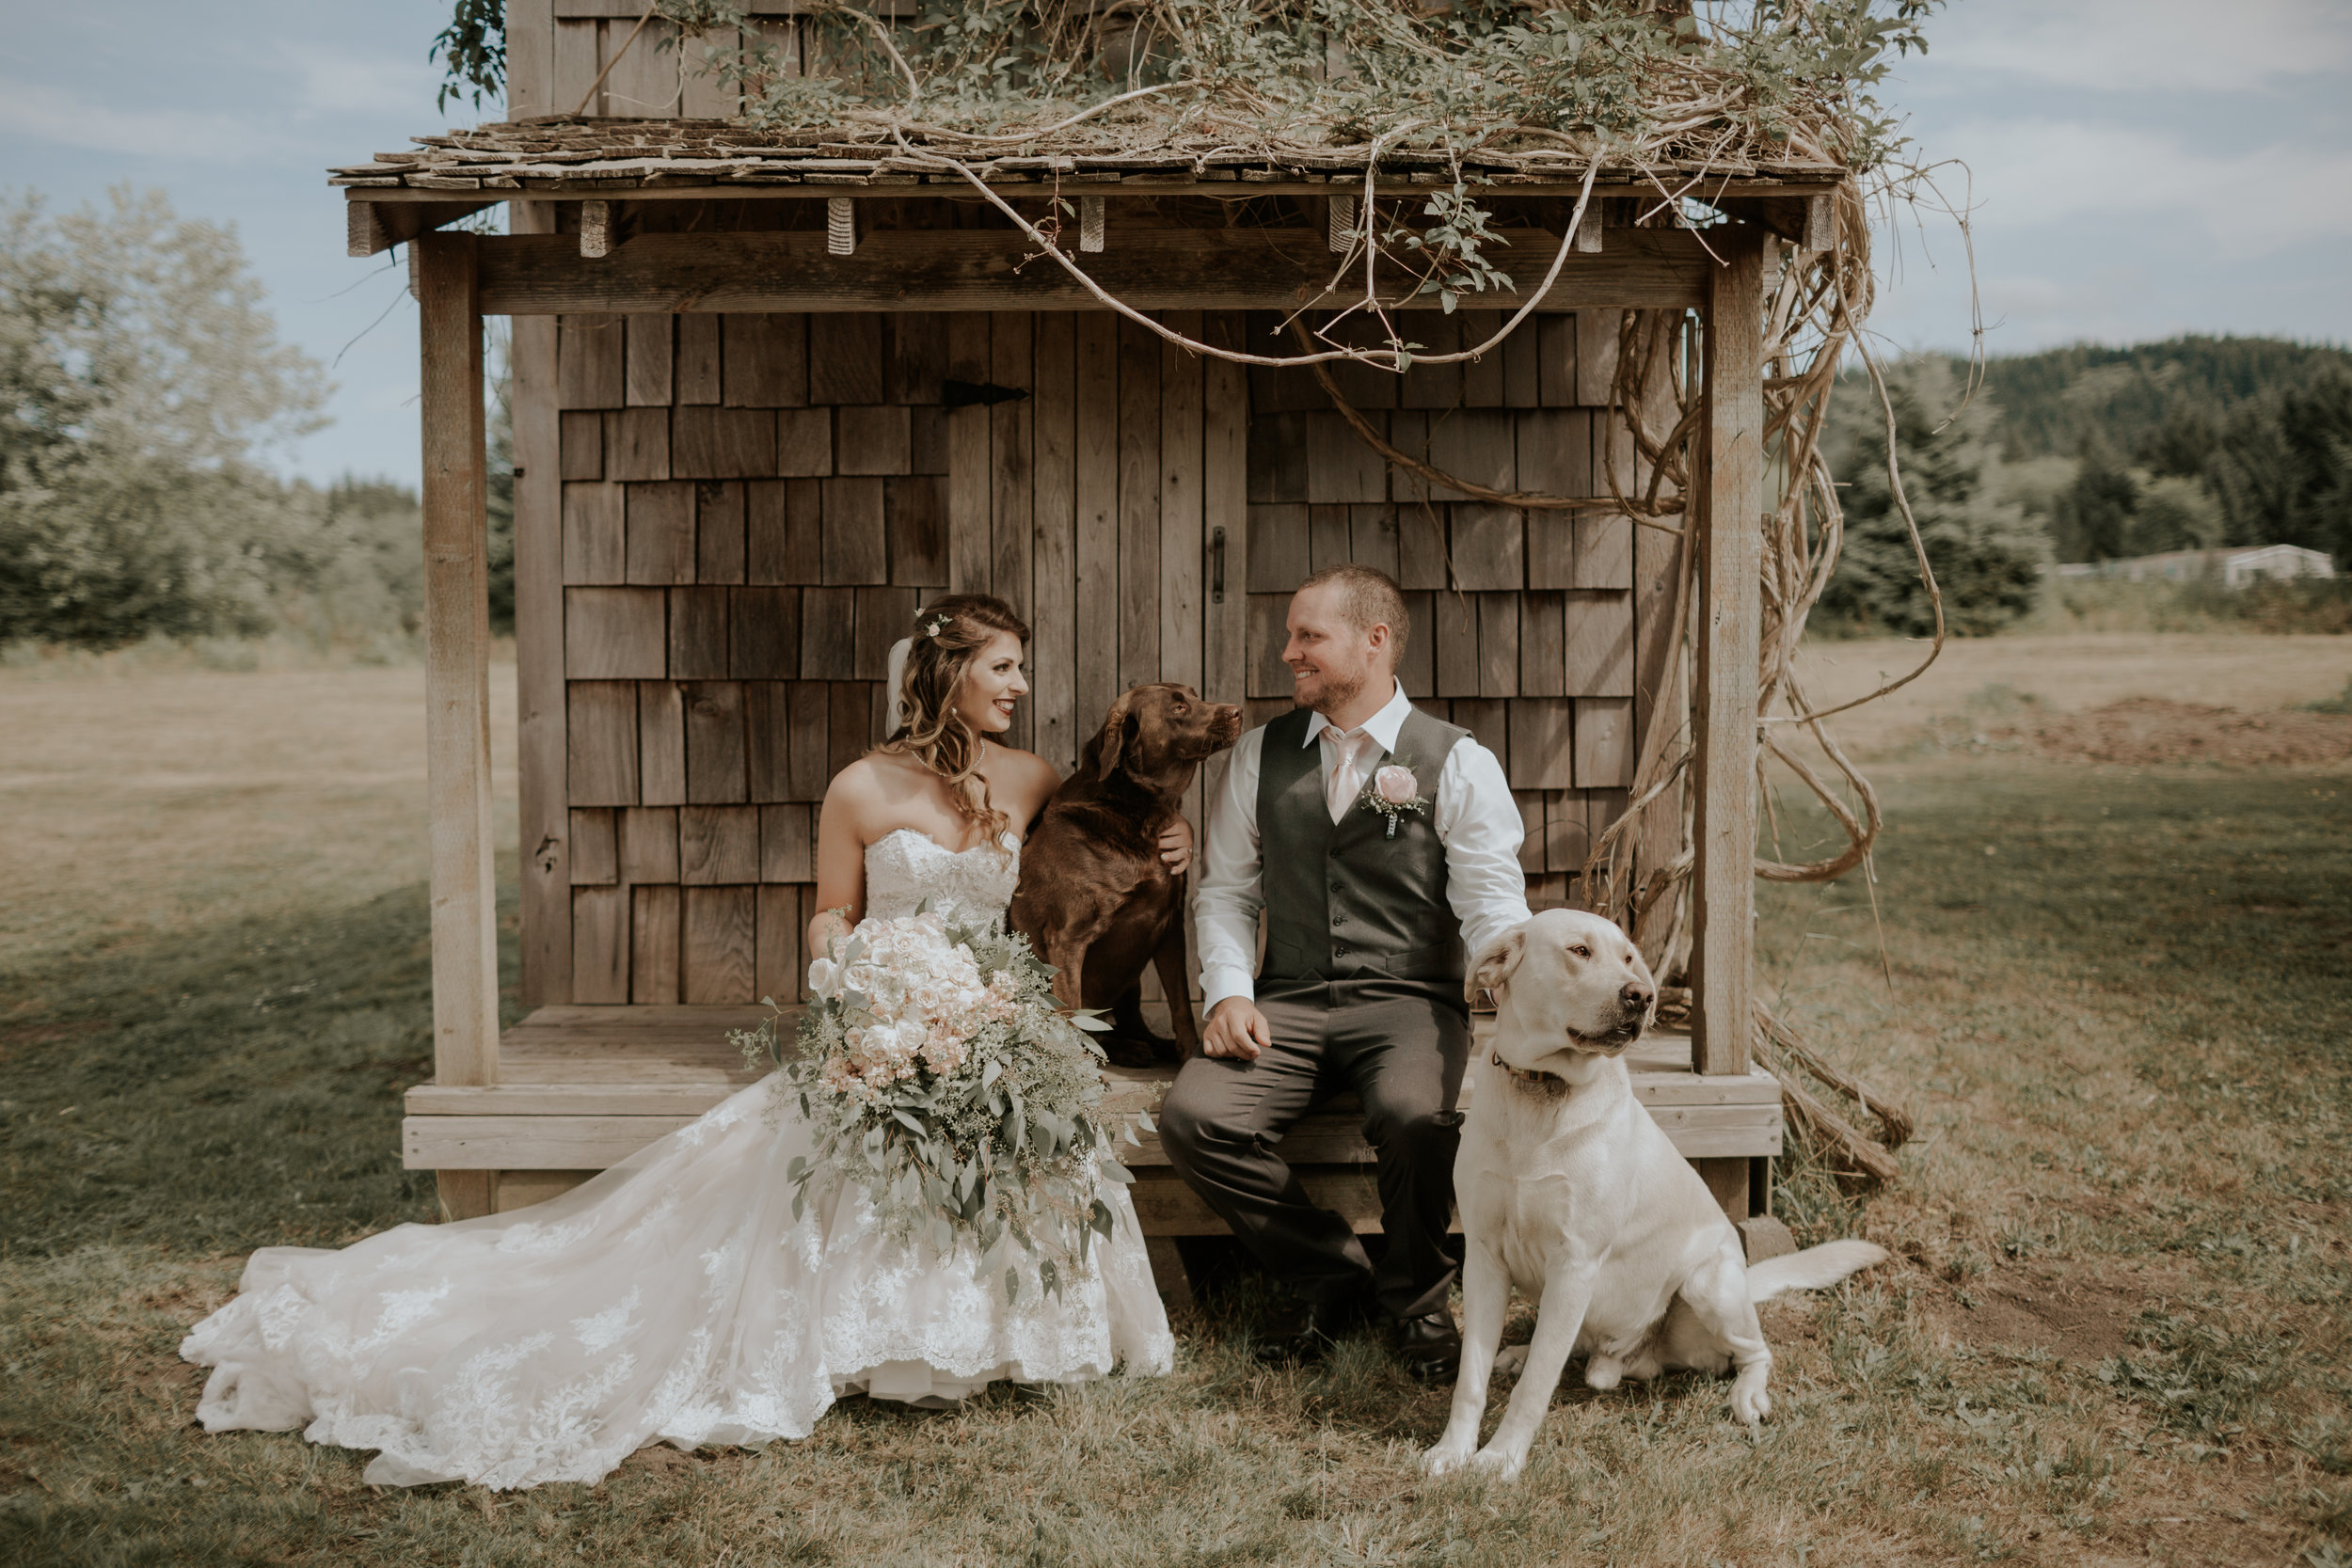 Olympic-Peninsula-Wedding-Photographer-PNW-Forks-Port-Angeles-Kayla-Dawn-Photography-engagement-Olympic-National-Park-129.jpg